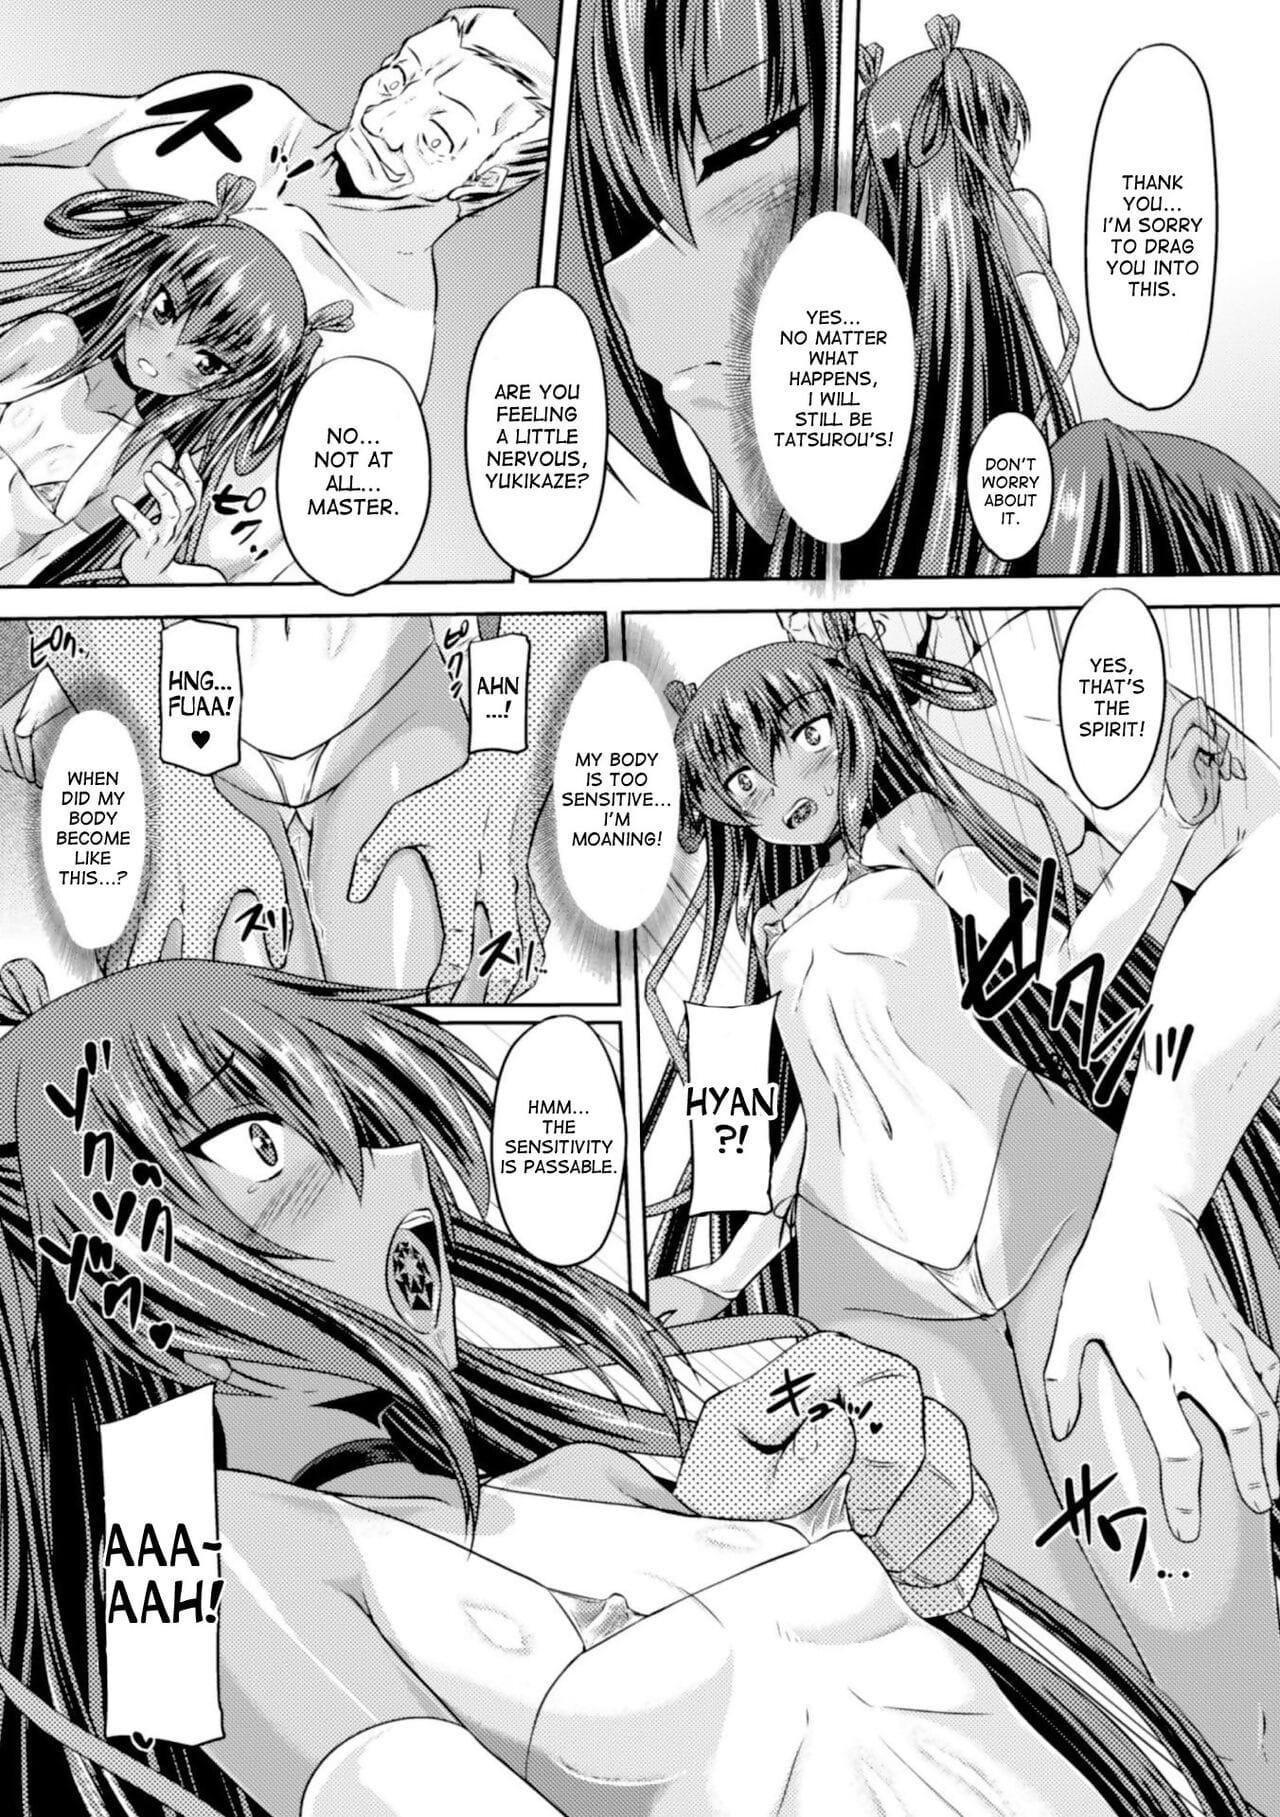 Taimanin Yukikaze - Taimanin wa Ingoku ni Shizumu #1-6 - Taimanin Yukikaze - Taimanins infect secure get under one\'s evil Acheron #1-6 - accouterment 2